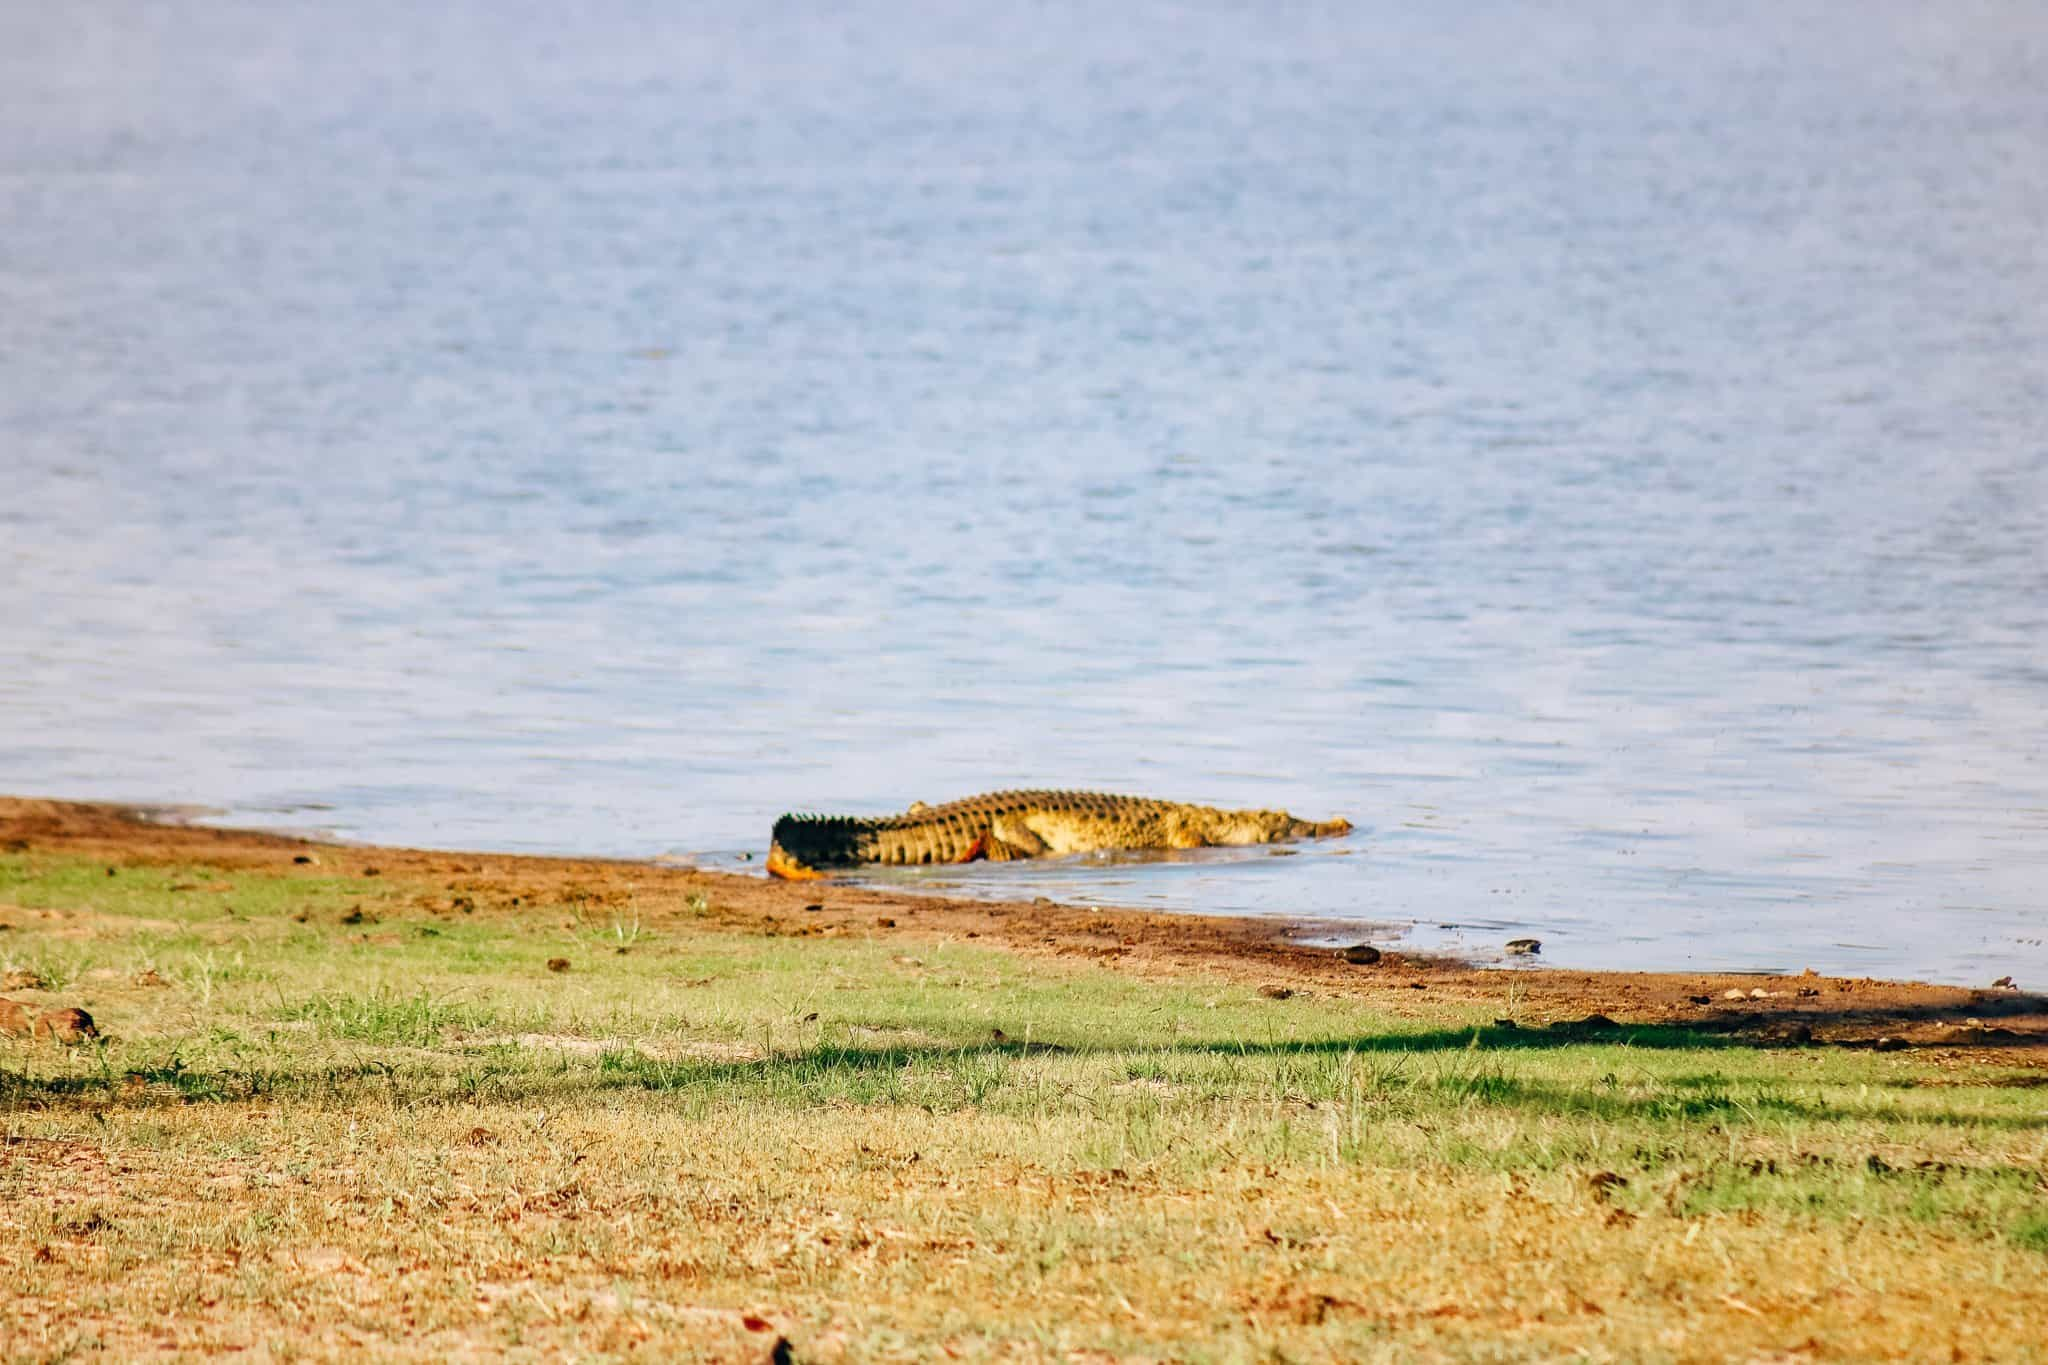 Crocodile on African Safari Drive in the Selous Game Reserve